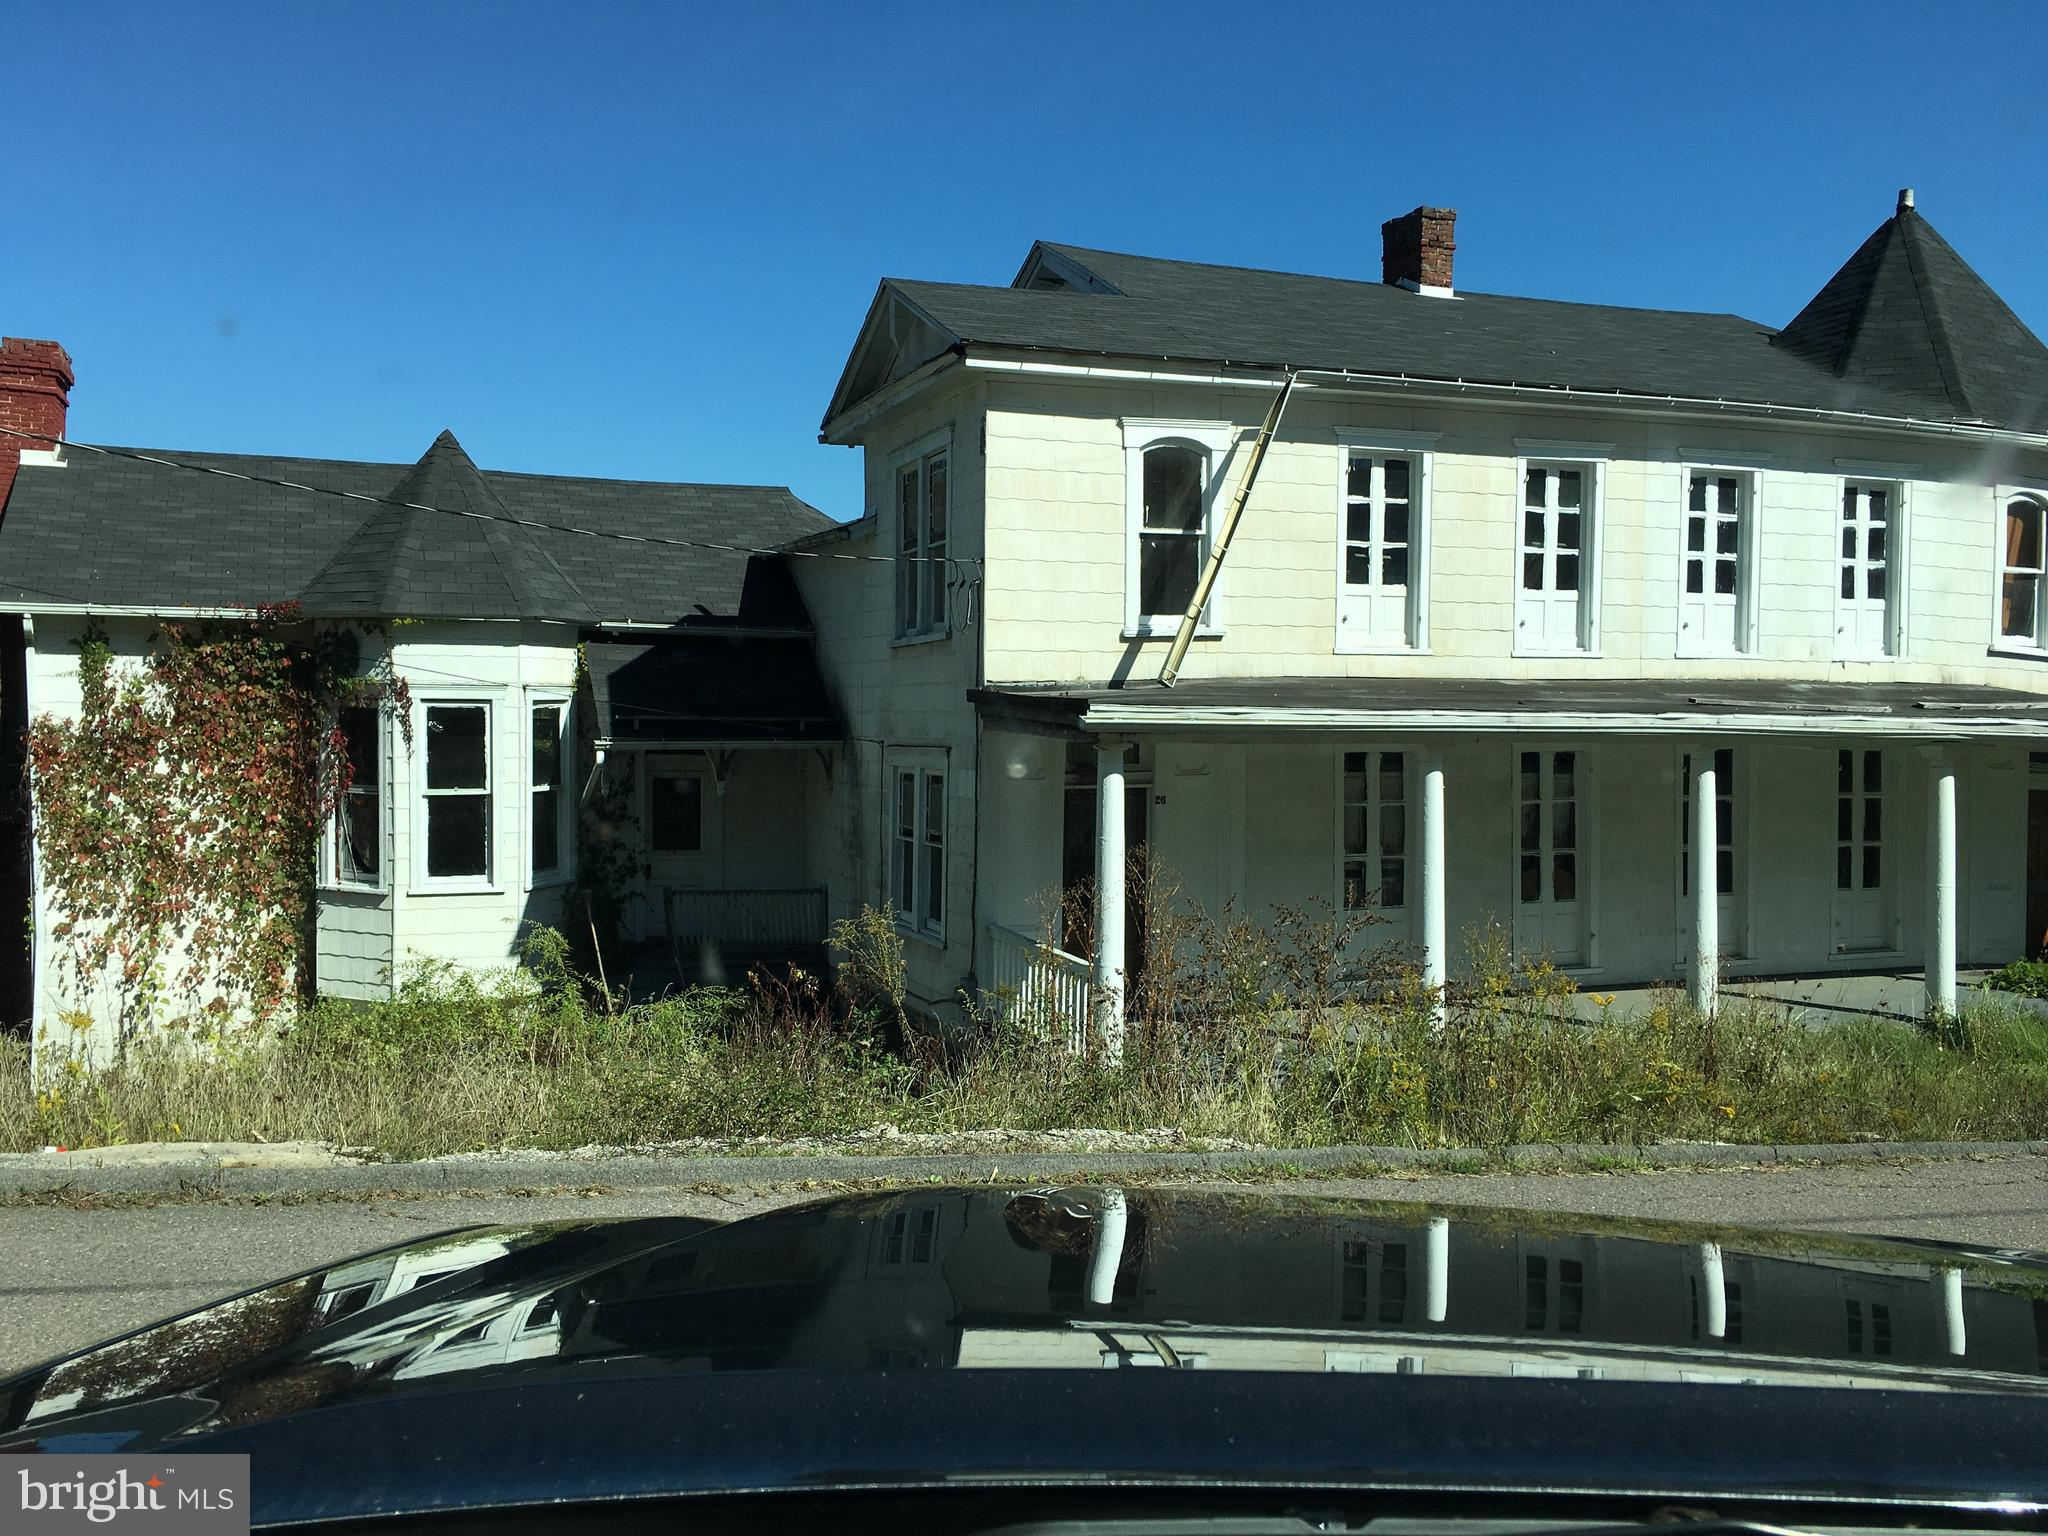 24 CHURCH STREET, LONACONING, MD 21539